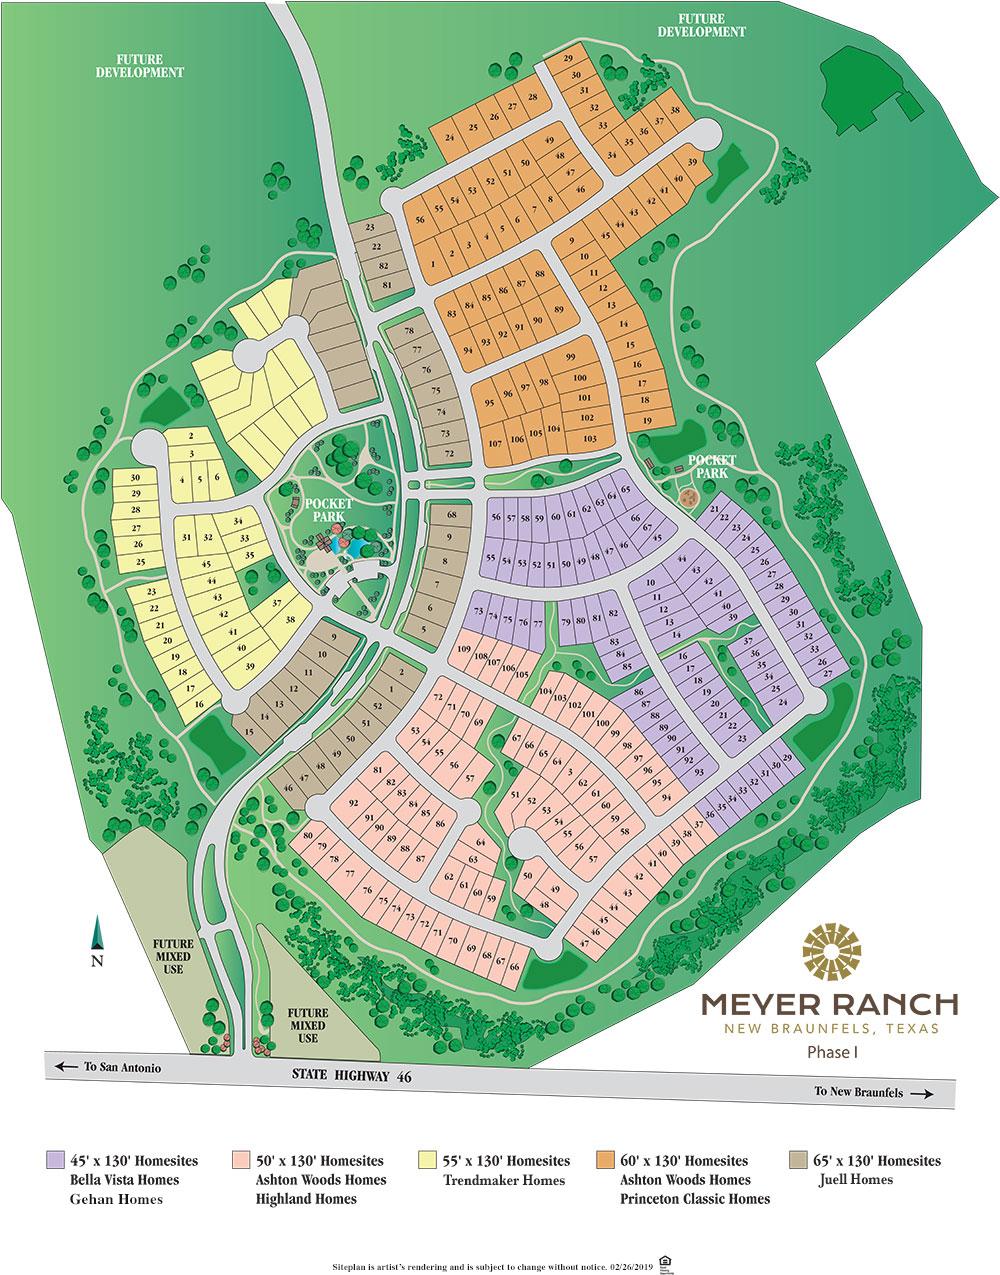 Meyer Ranch, New Braunfels Phase 1